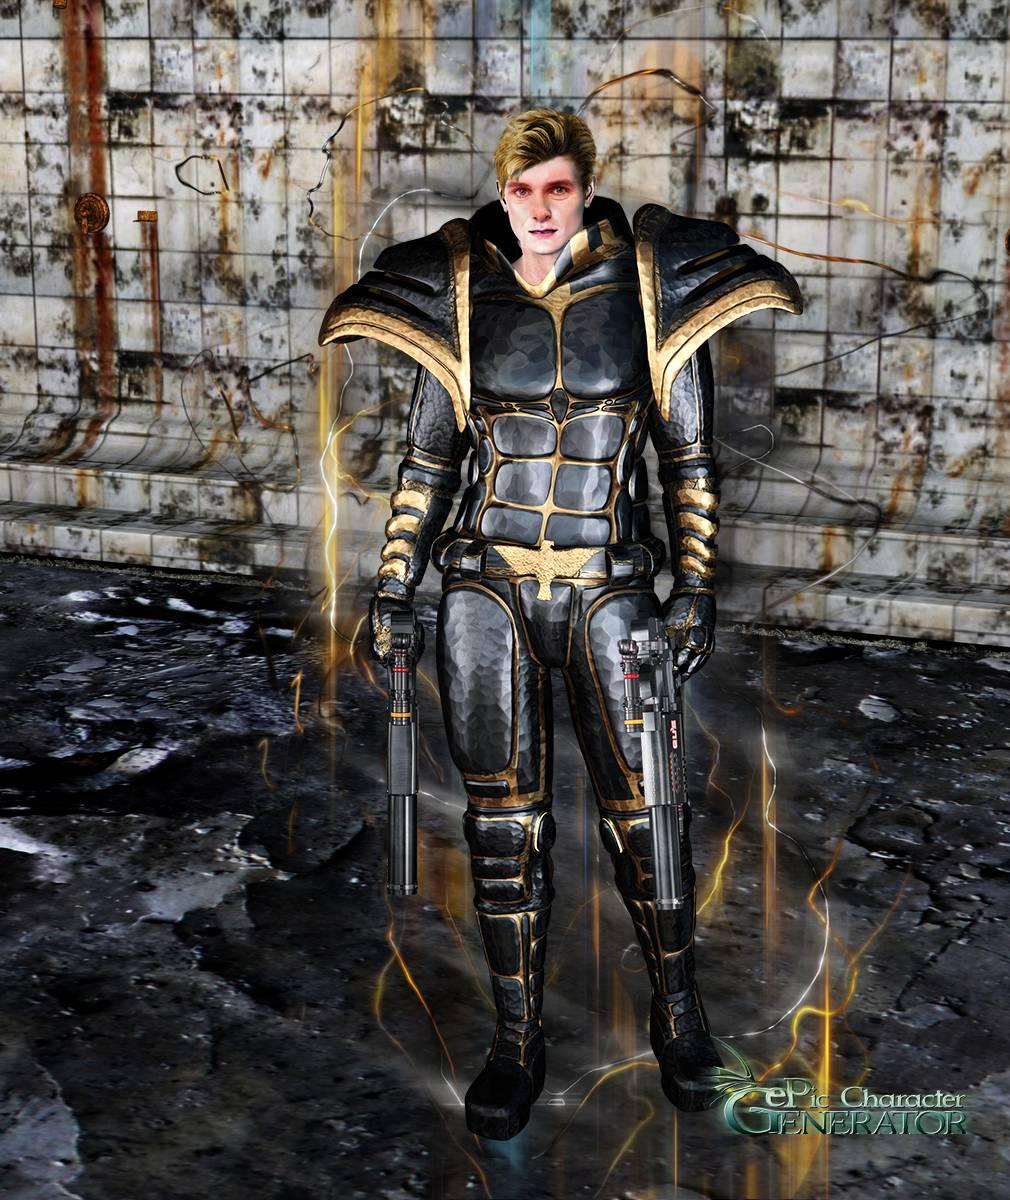 ePic Character Generator Season 2 Male Superhero Screenshot 03